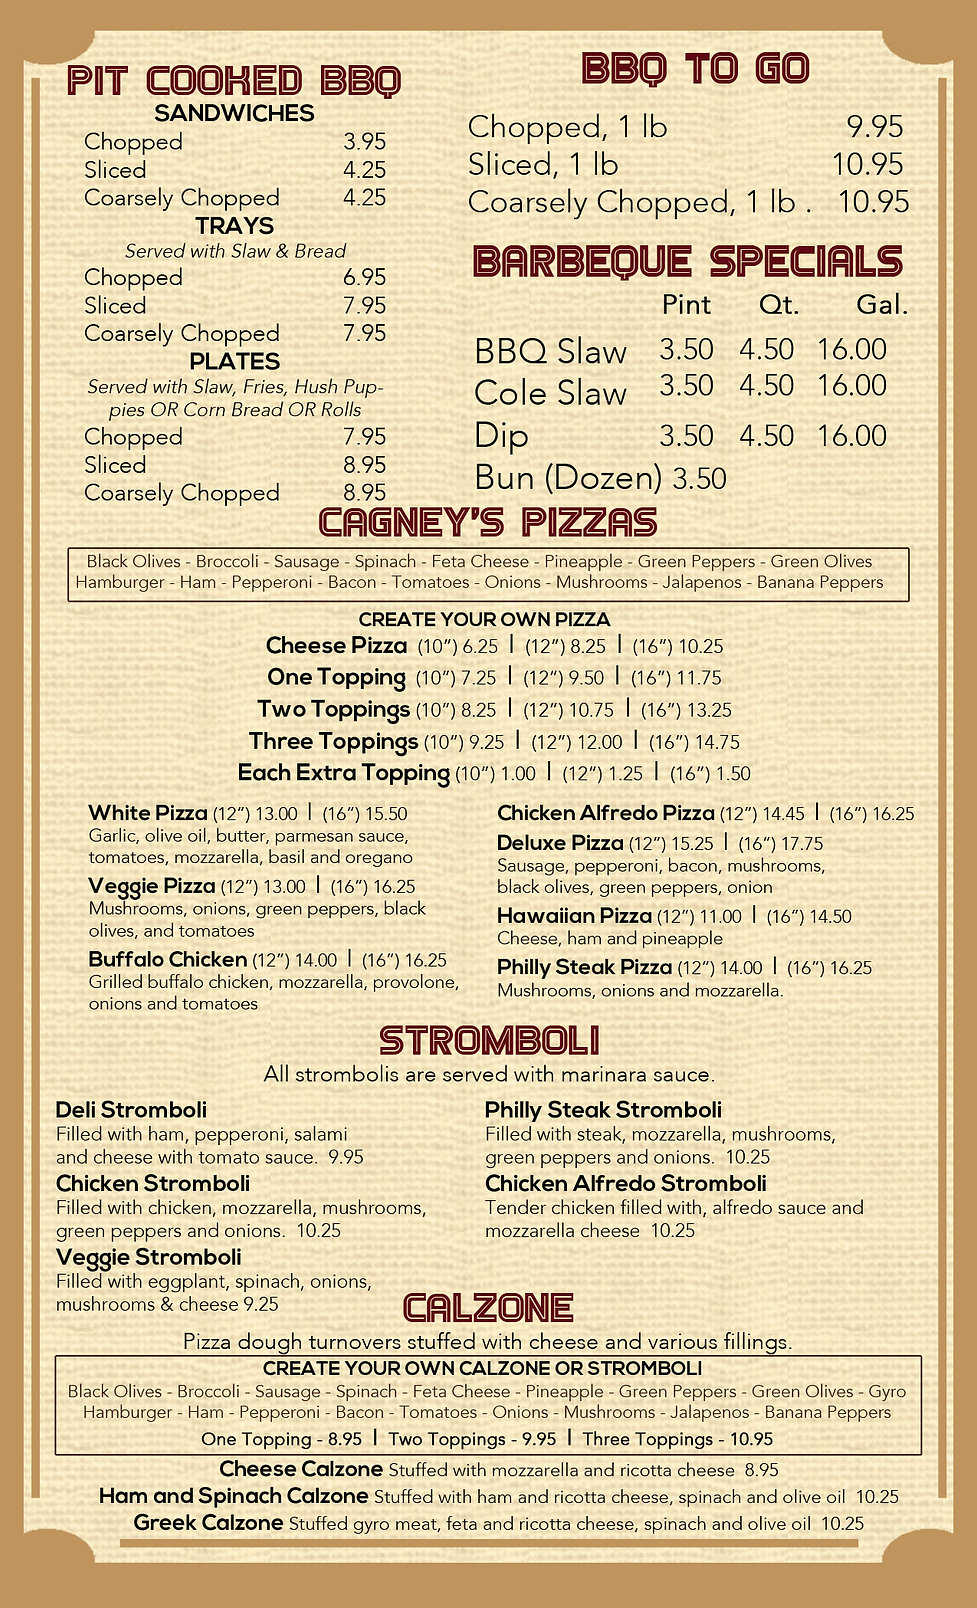 bbq&pizzas.jpg